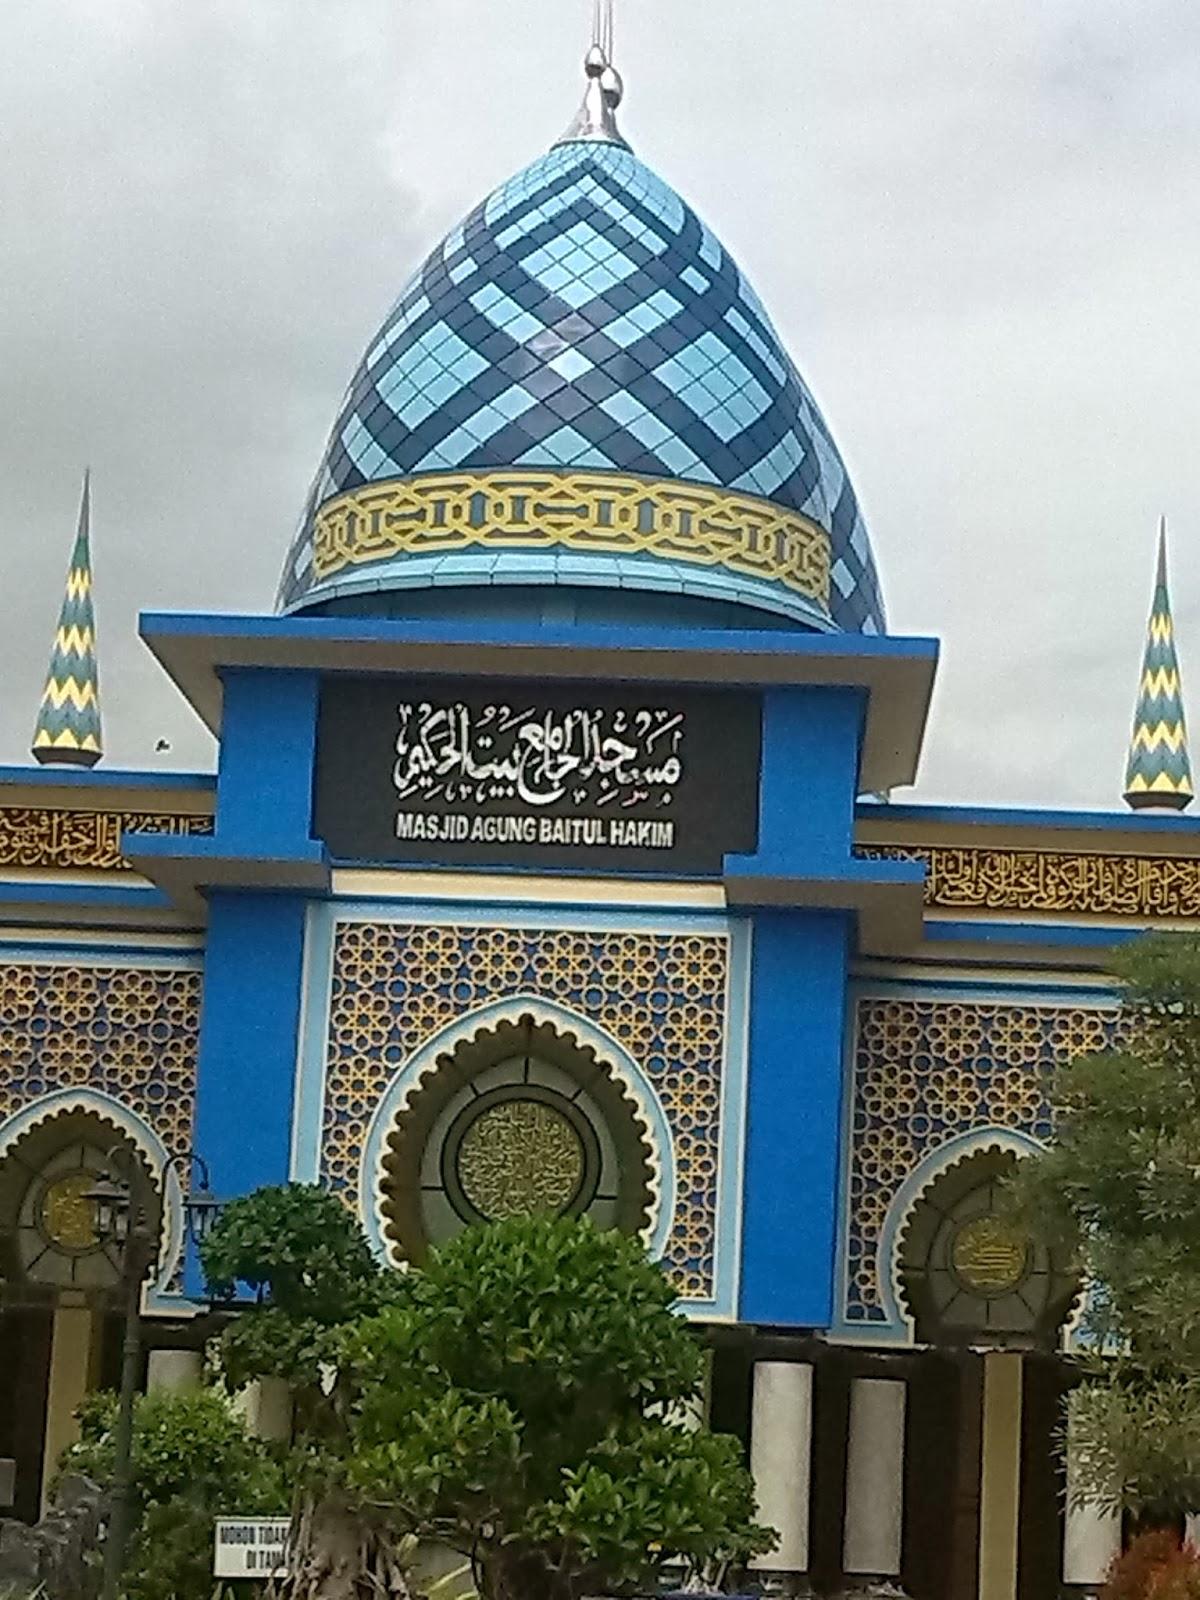 Seratusnegara Situs Islam Sewulan Img 20140131 093405 Jpg Makam Masjid